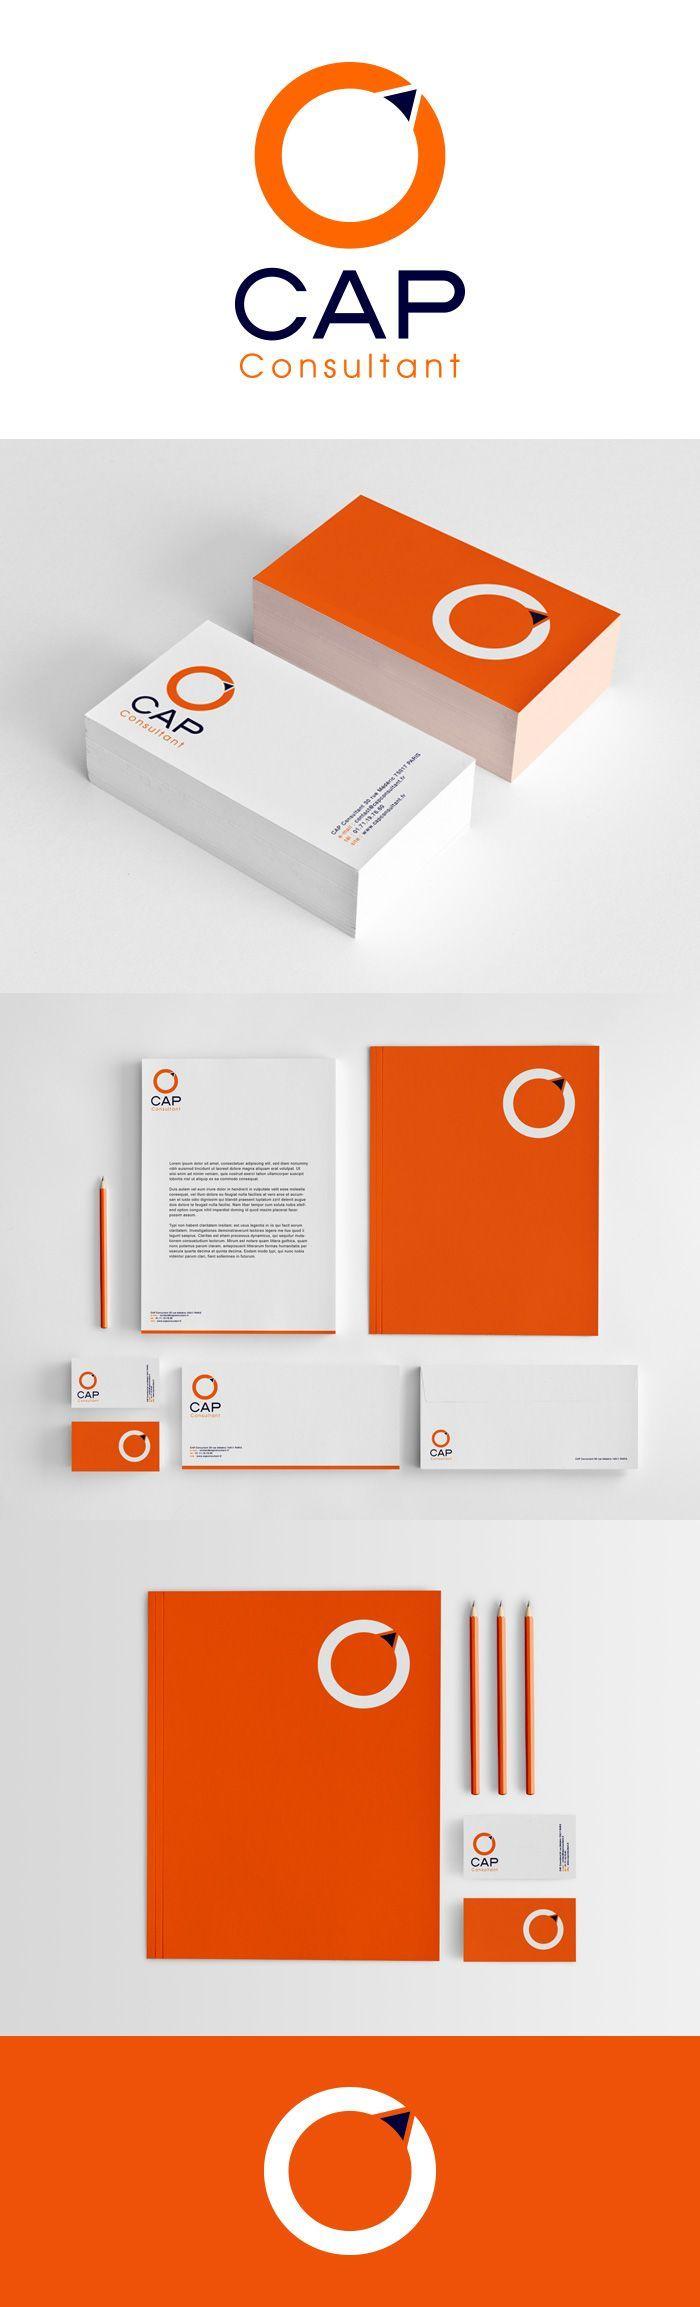 graphiste freelance, illustrateur et webdesigner. Création graphique de logo, support de communication, identité visuelle, illustration, mascotte, packaging, webdesign...: